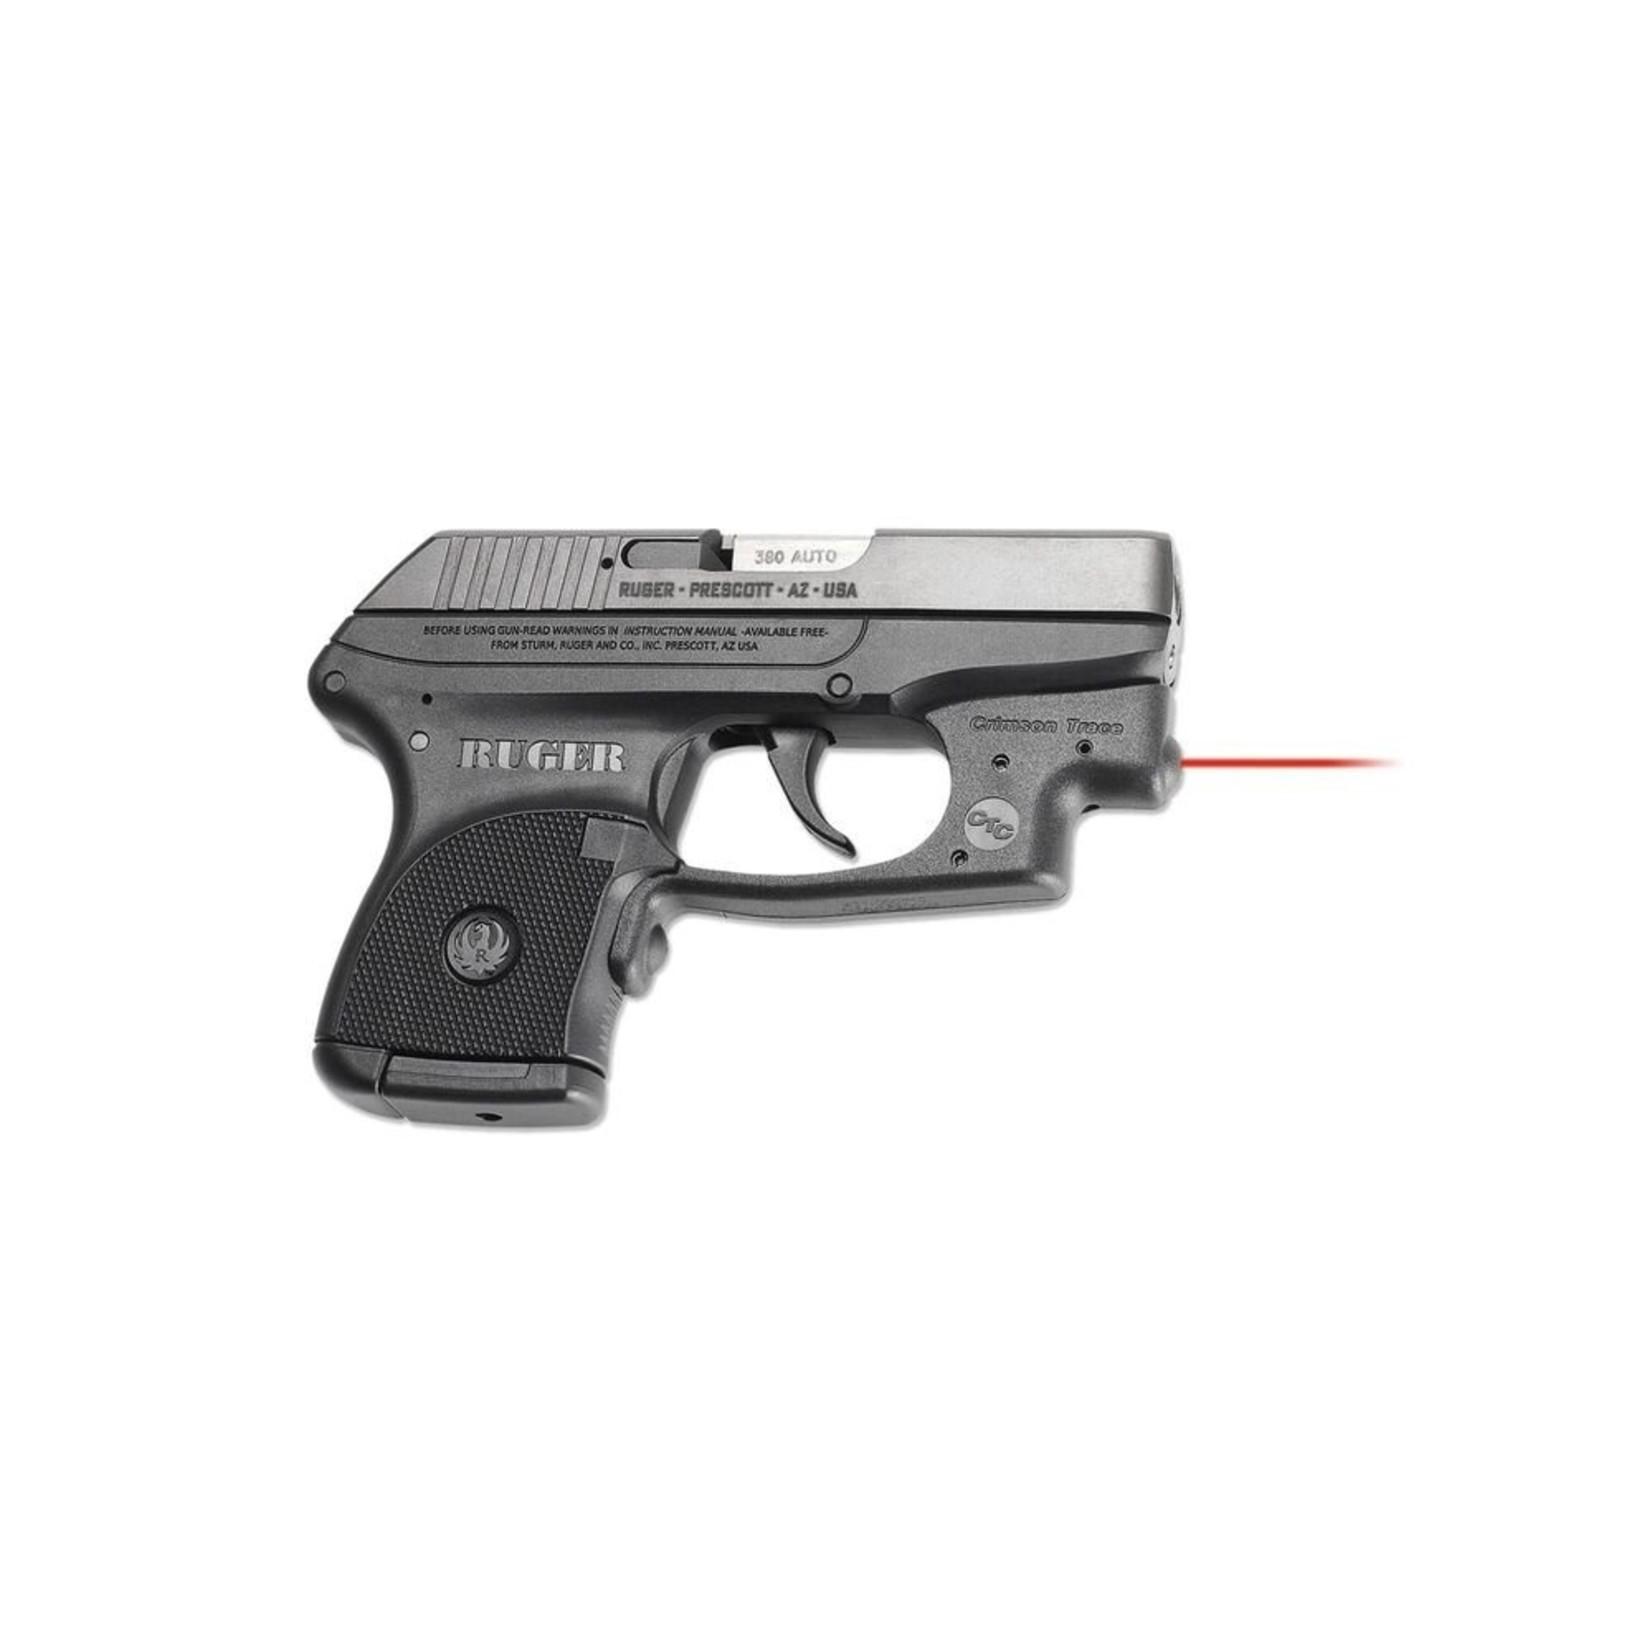 Crimson Trace LG-431 Laserguard Laser Sight, Blk, Pressure Sensor